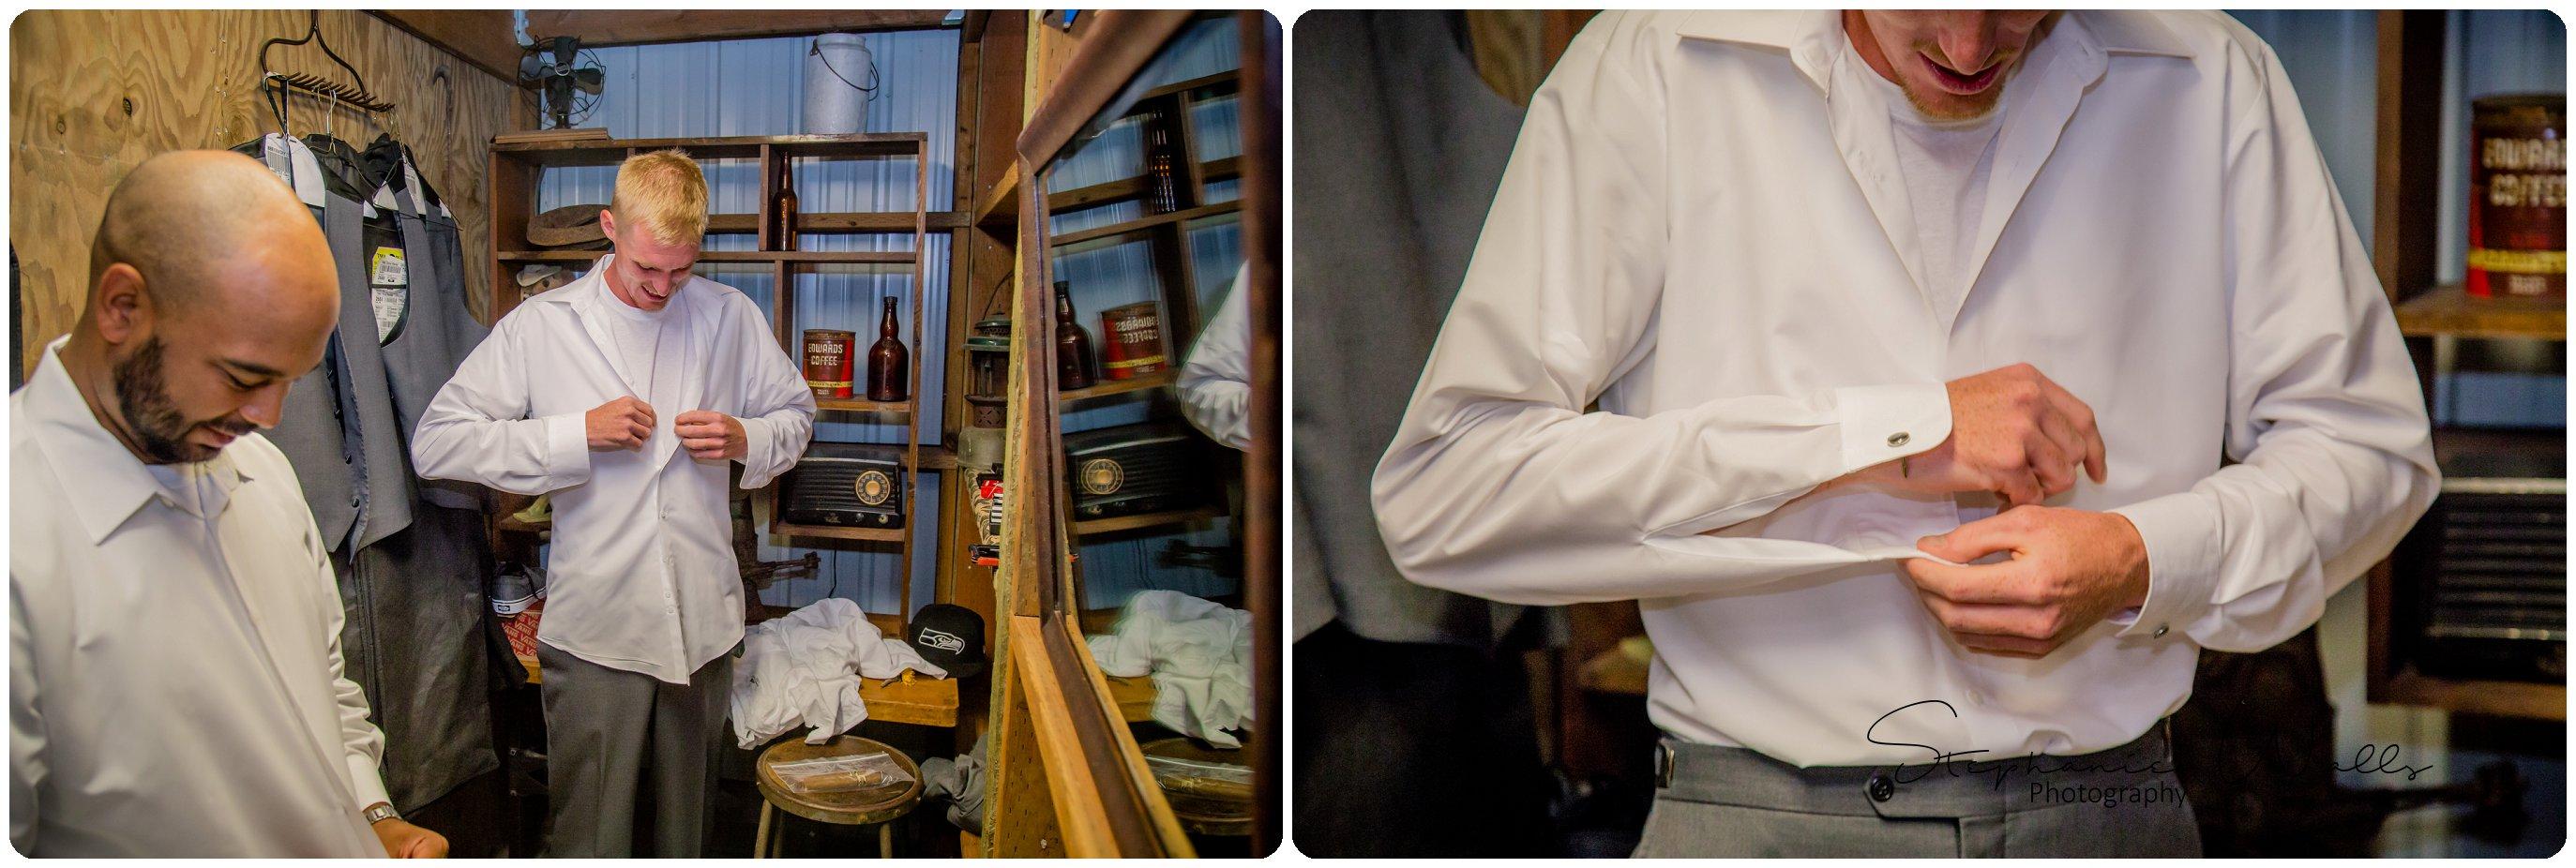 Kimble Wedding 003 1 Marlena & Allans | Snohomish Red Barn Events (Stocker Farms) | Snohomish, Wa Wedding Photographer